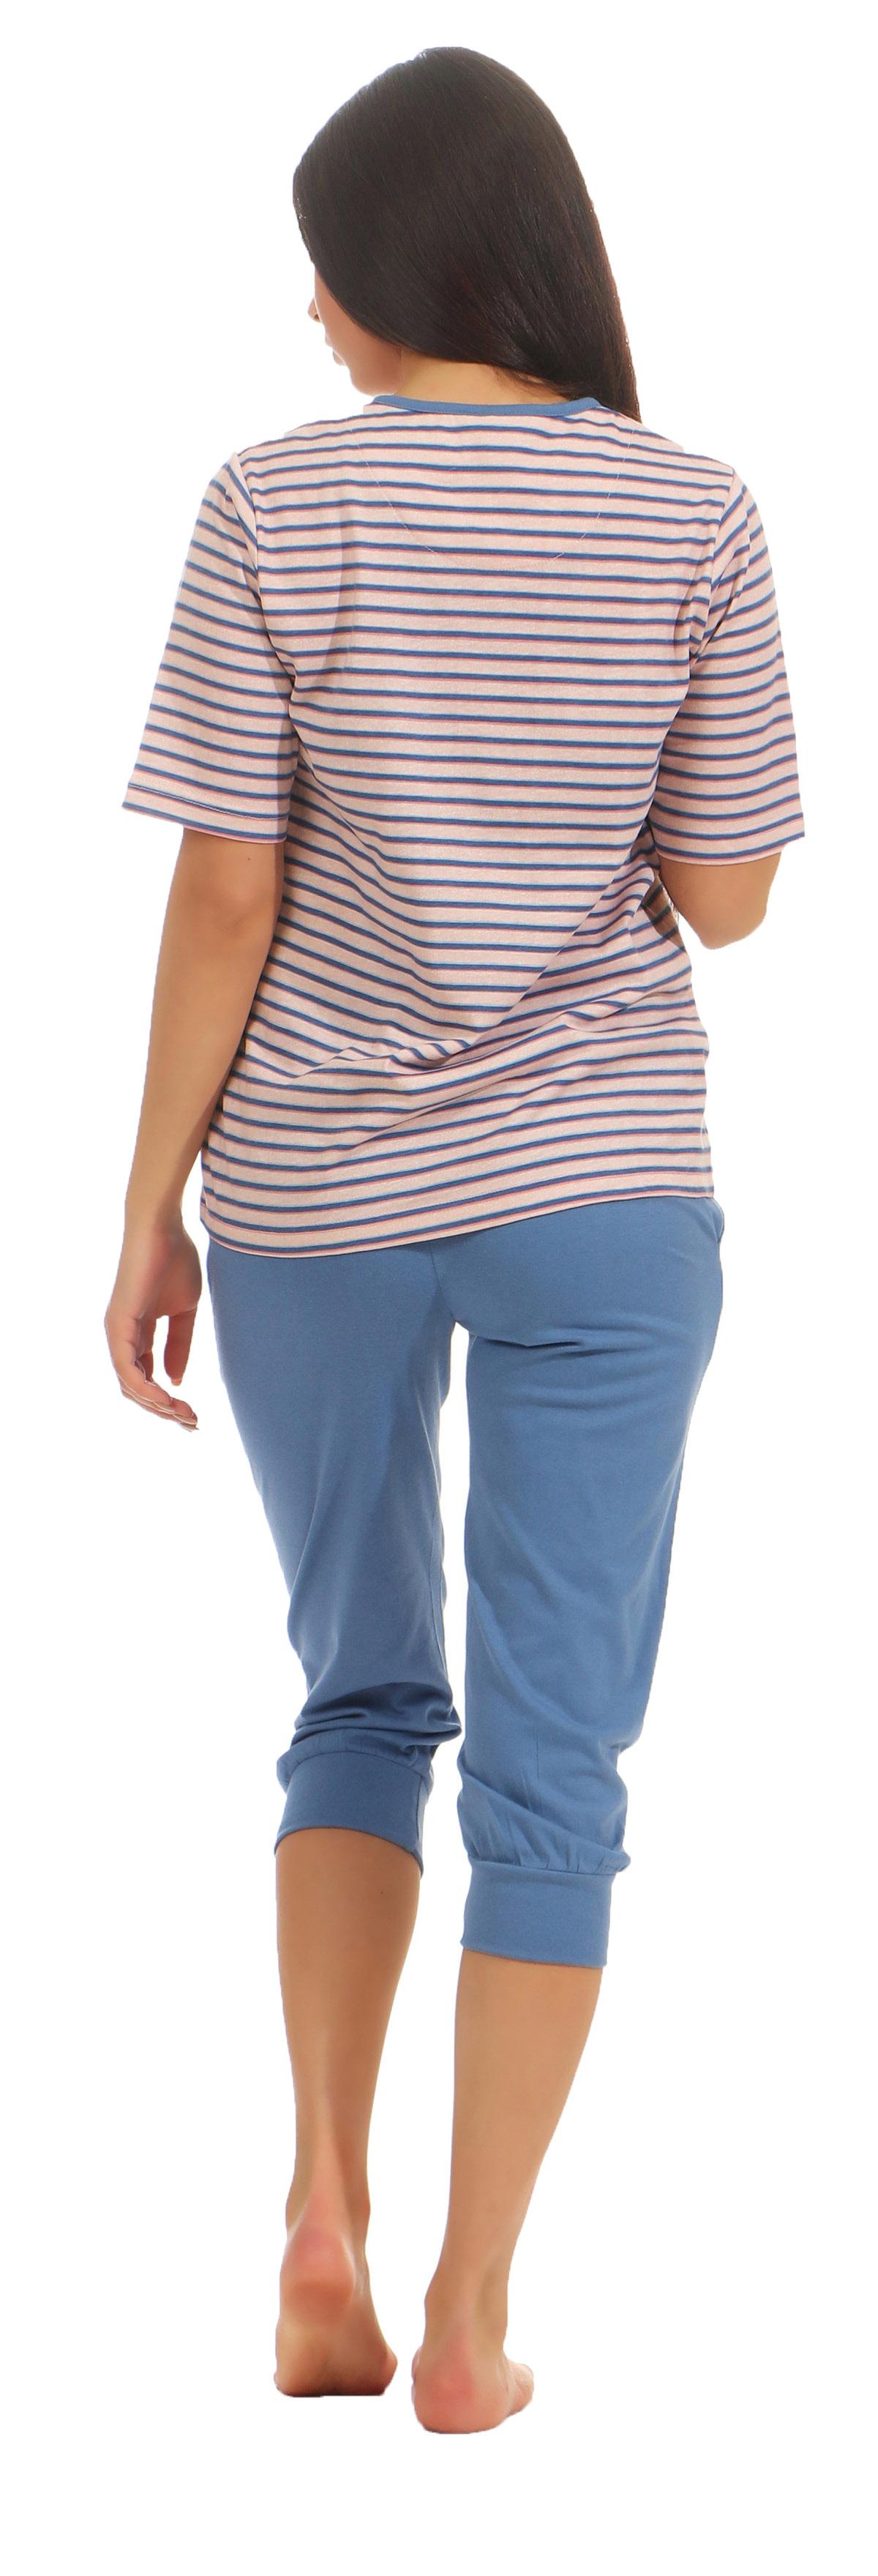 Damen Capri Pyjama Schlafanzug kurzarm in einer tollen  Streifen Optik 181 204 90 224 – Bild 4